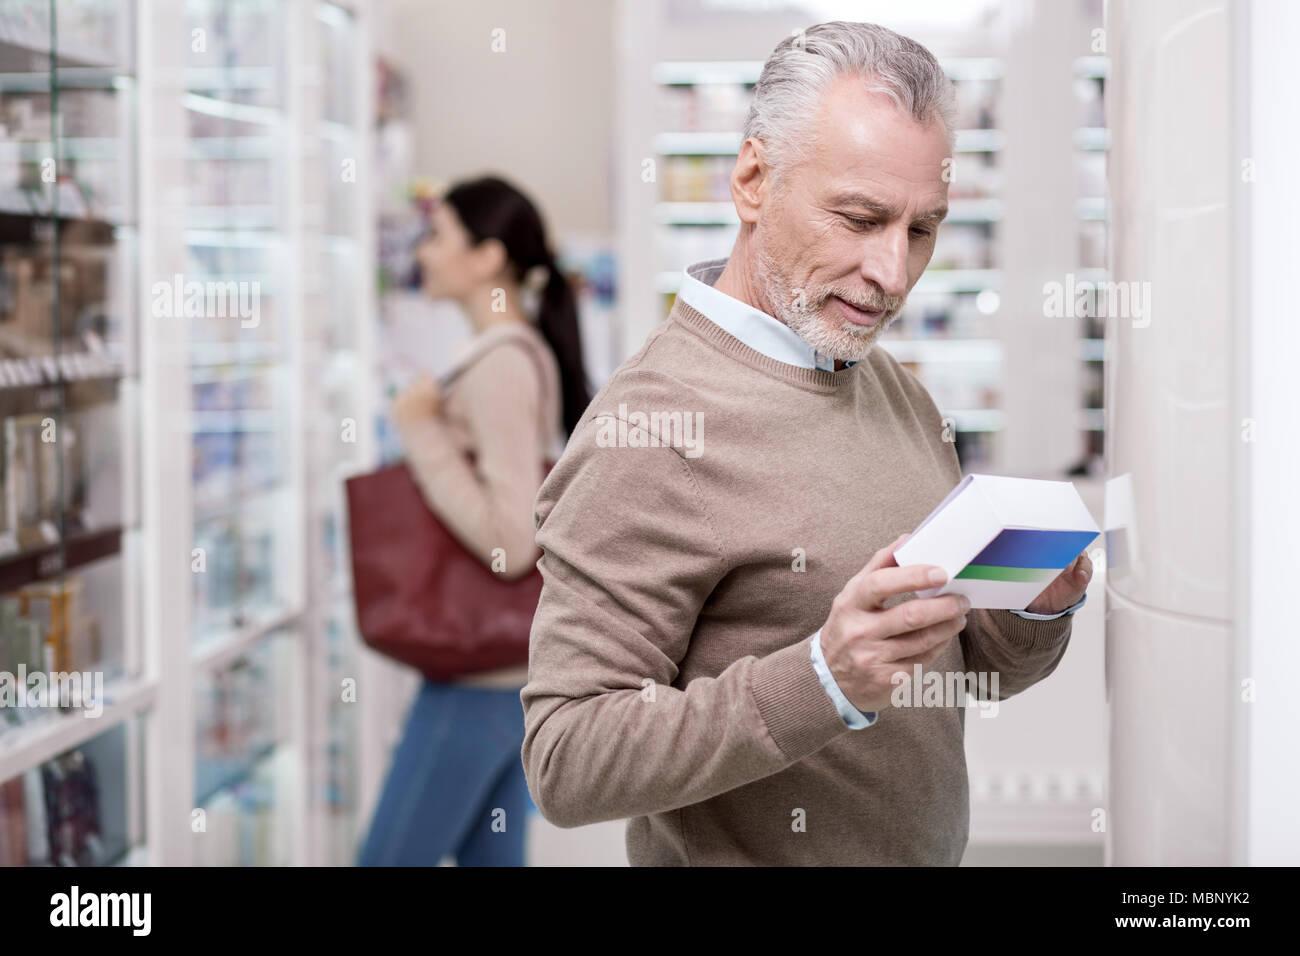 Pleasant senior man selecting medication - Stock Image